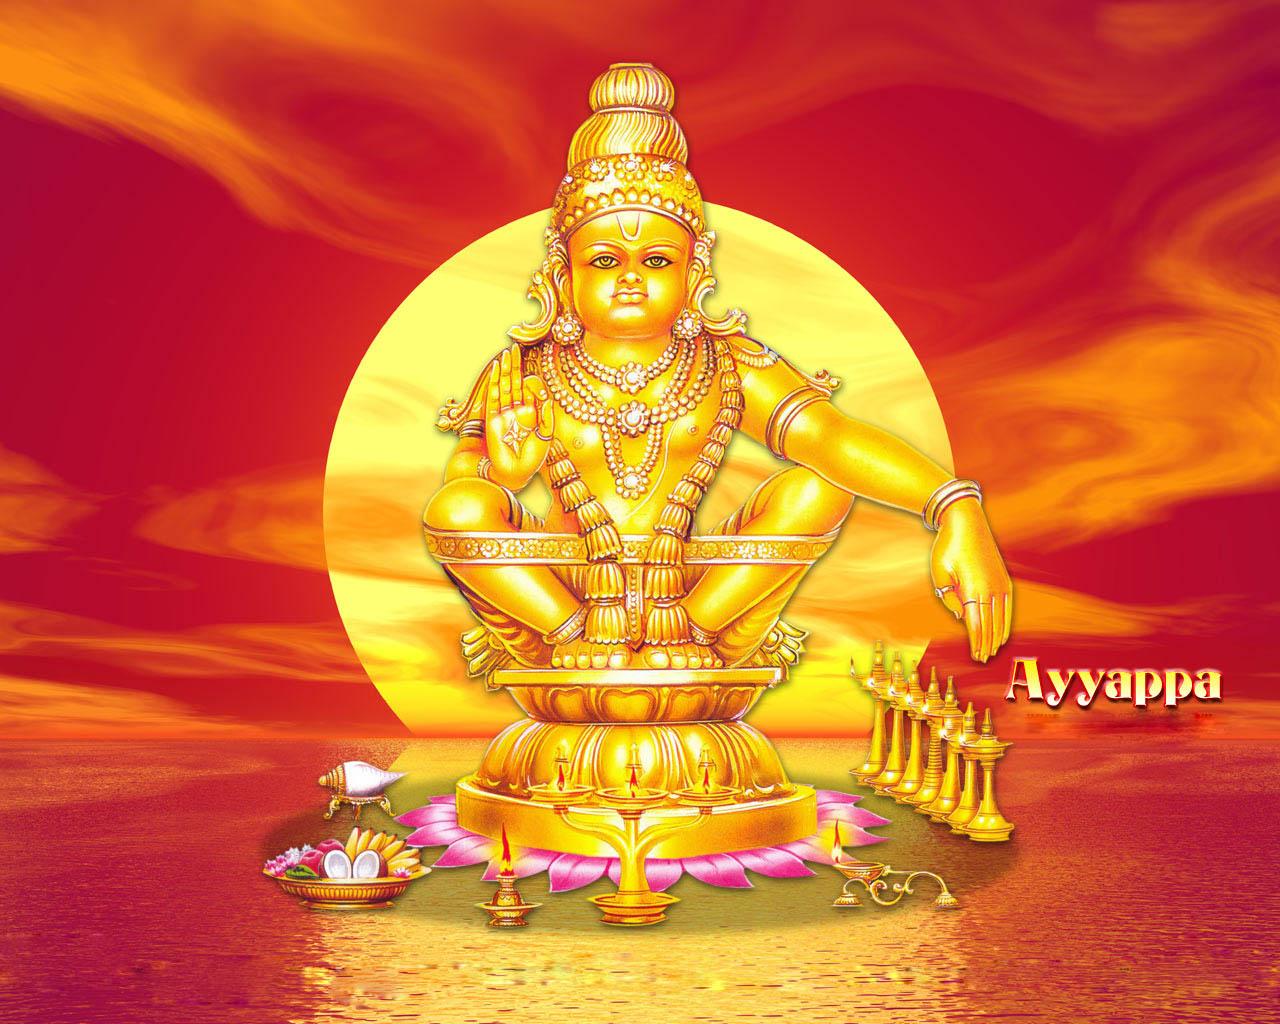 Ayyappa Images Hd Wallpaper Free Download - download wallpaper